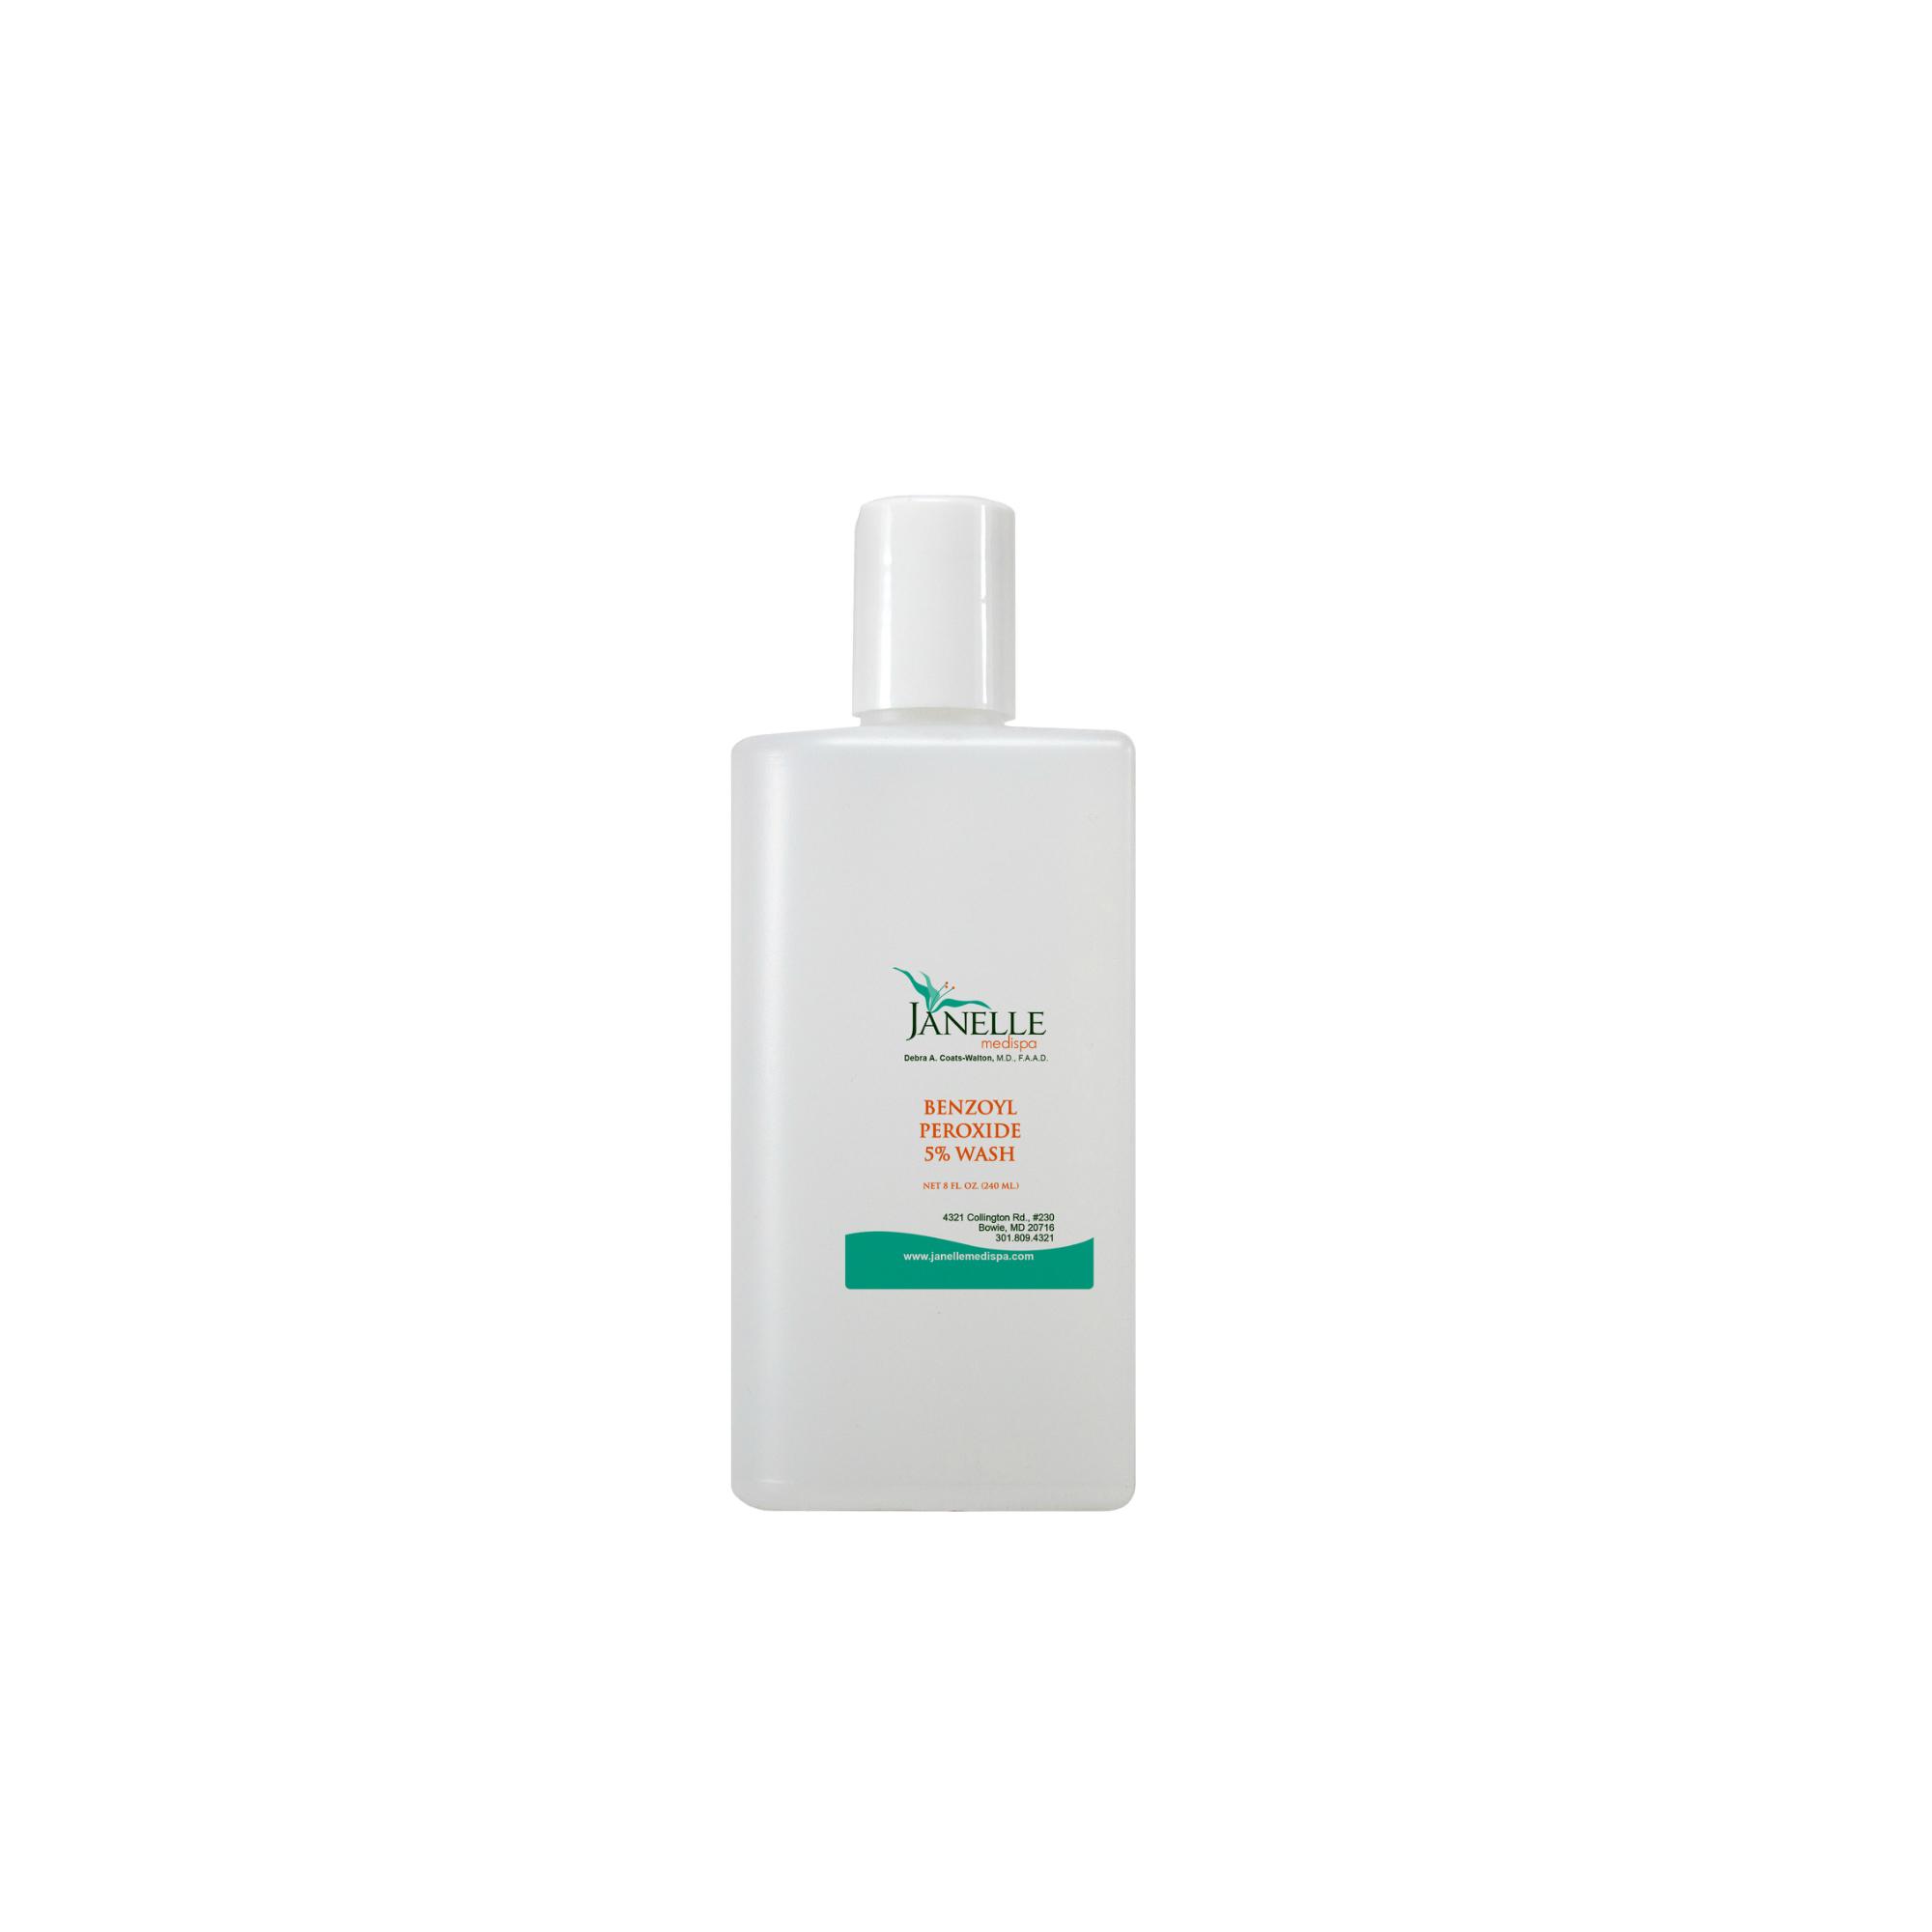 Benzoyl peroxide wash 5